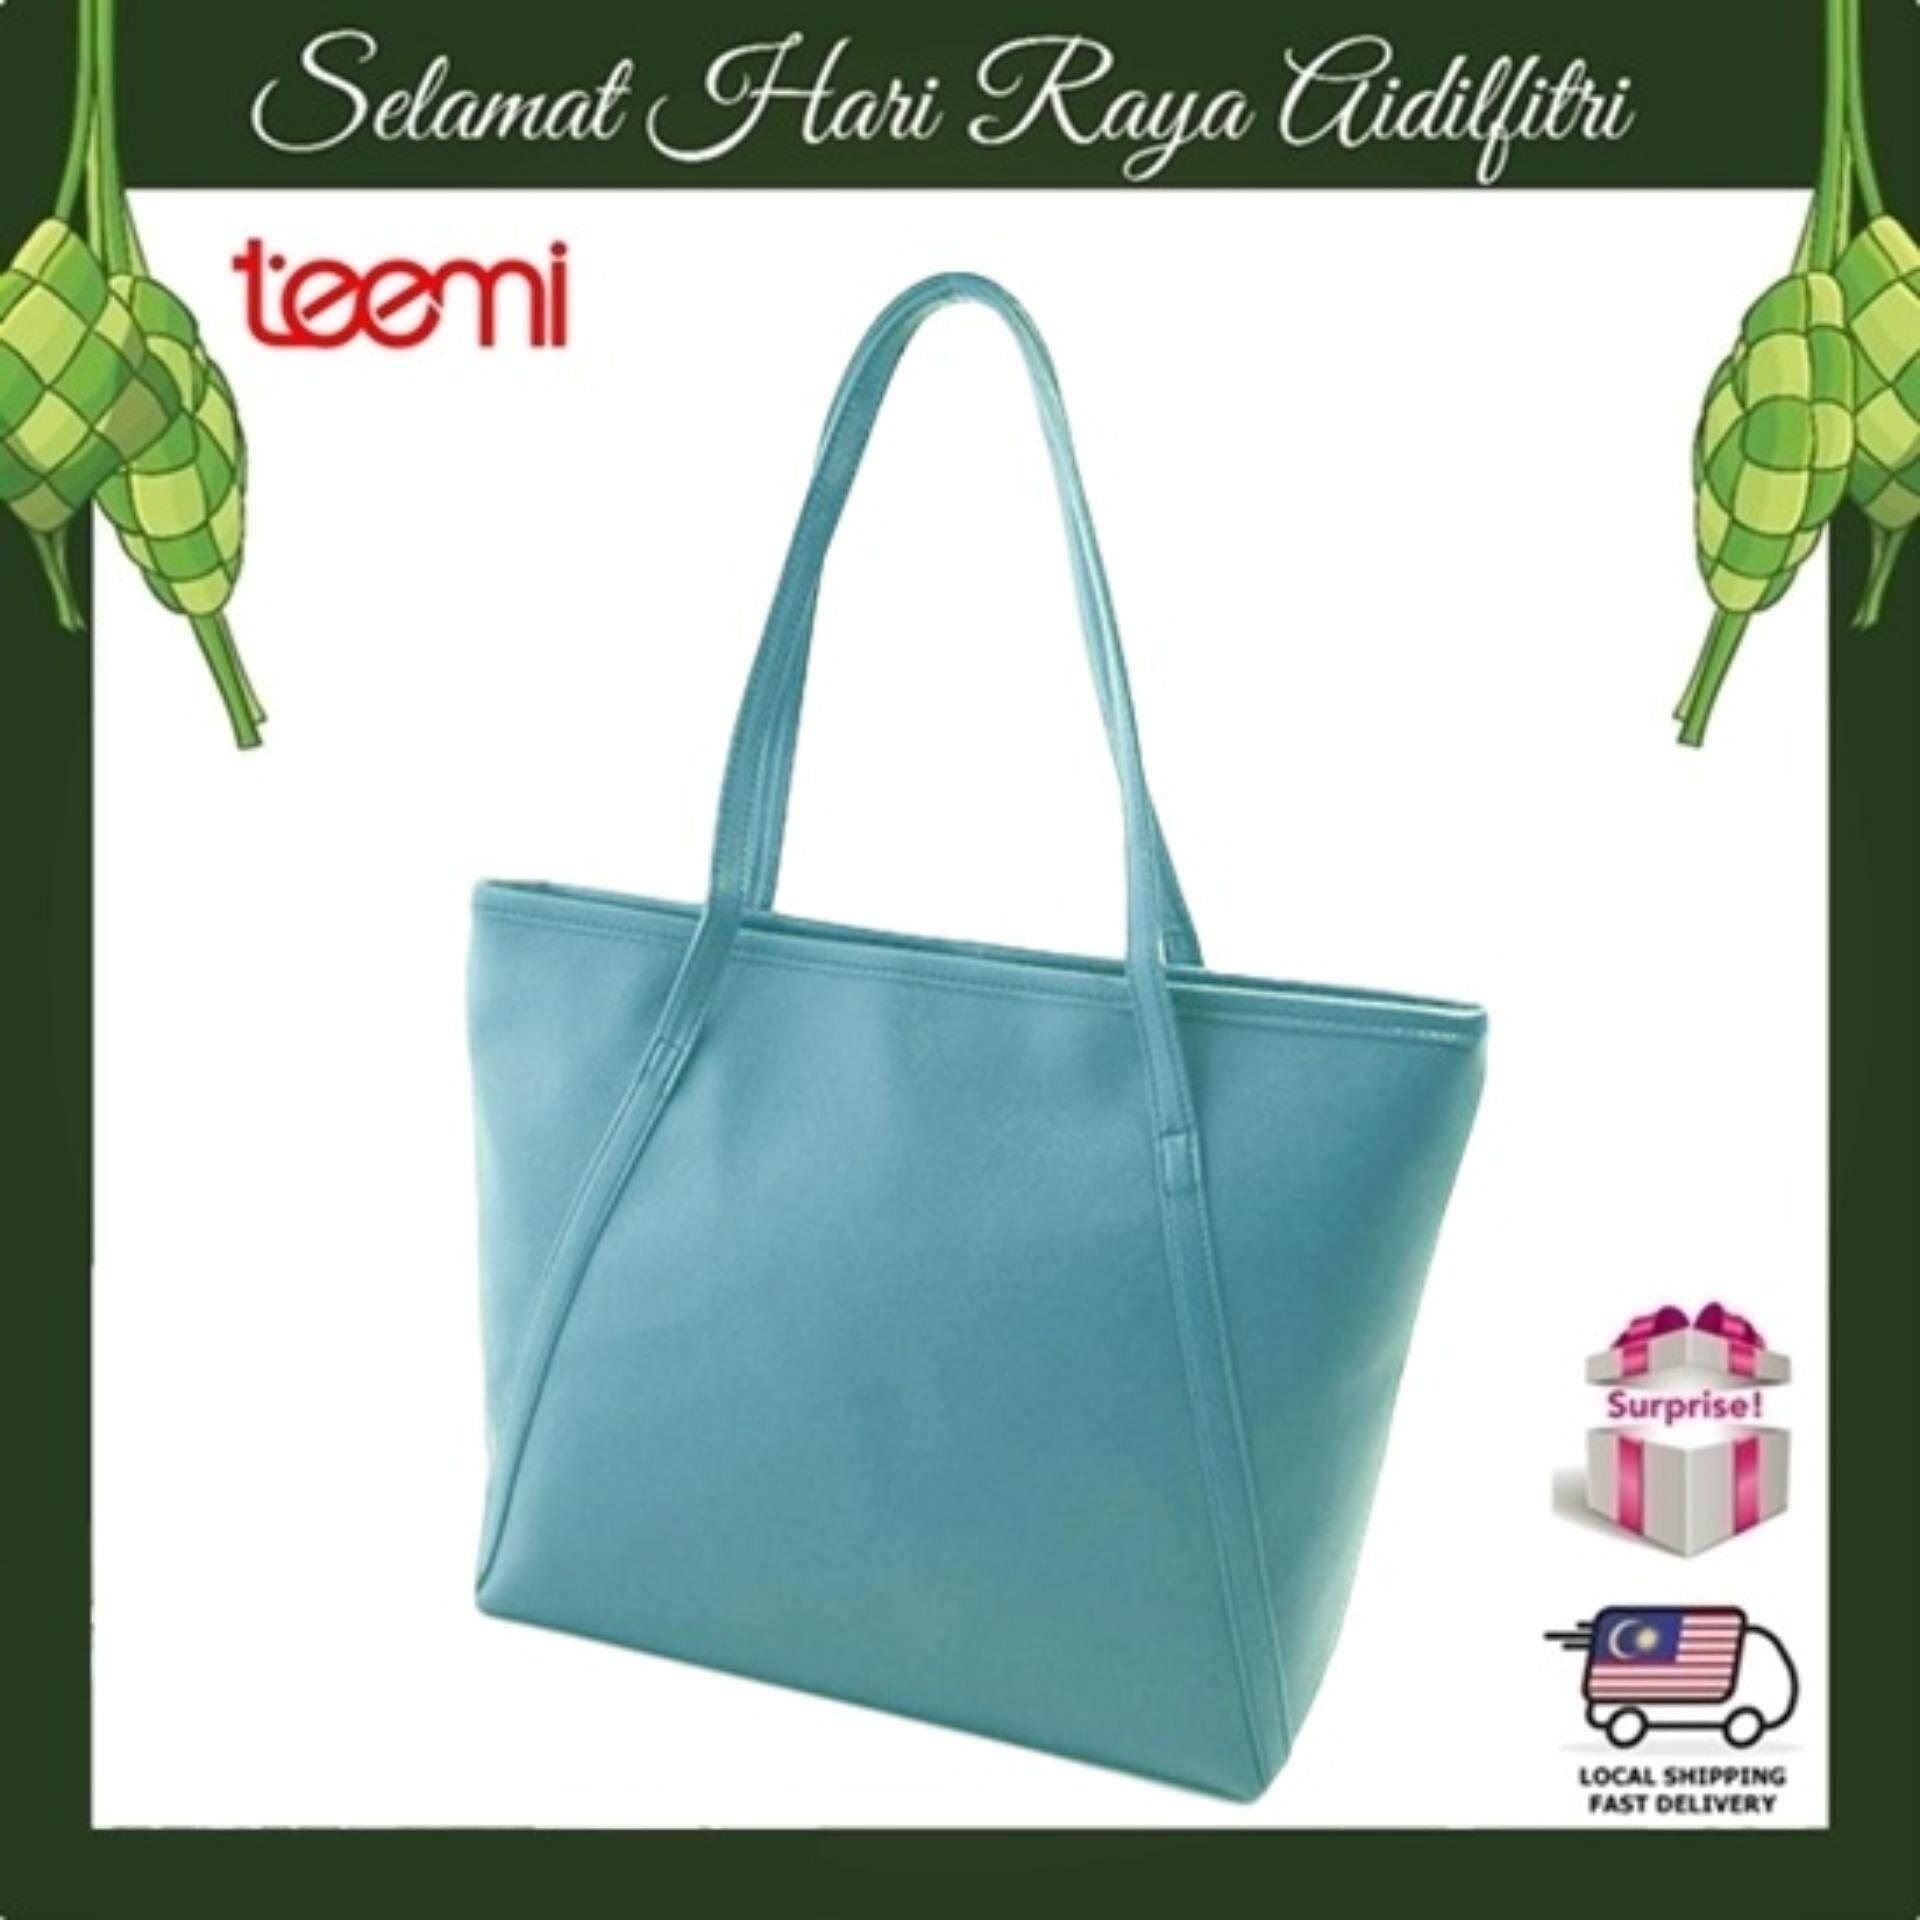 TEEMI Elegant Korean Style PU Leather Large Tote Bag Women Handbag Shoulder Shopper Bag - Light Blue